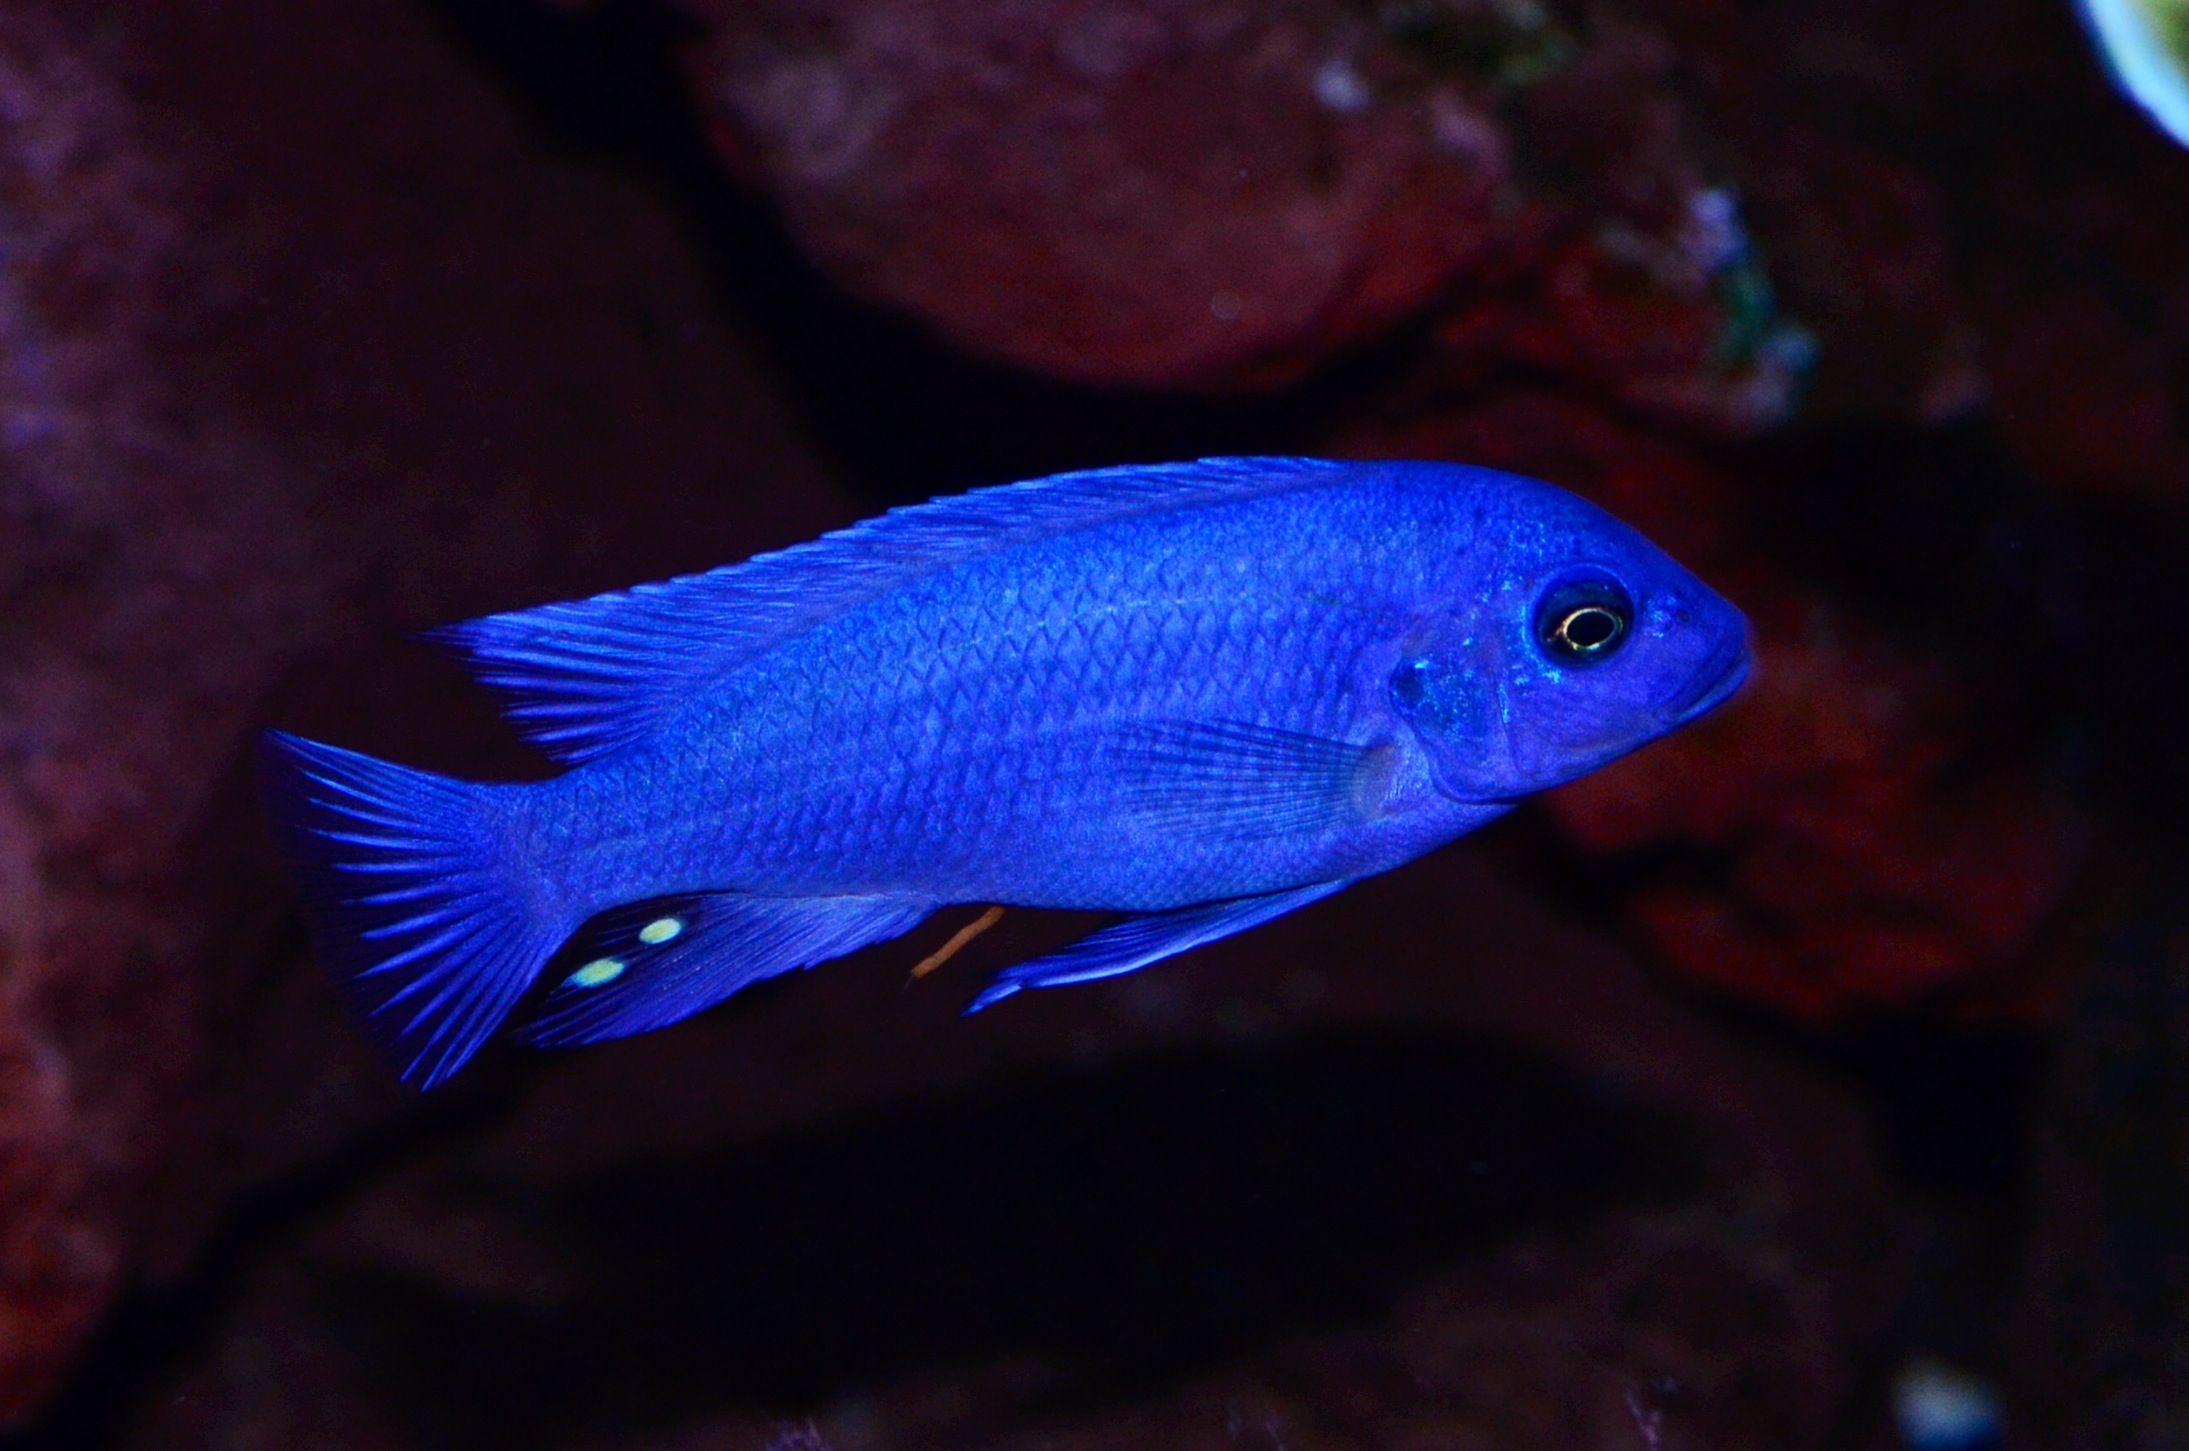 Blue freshwater fish